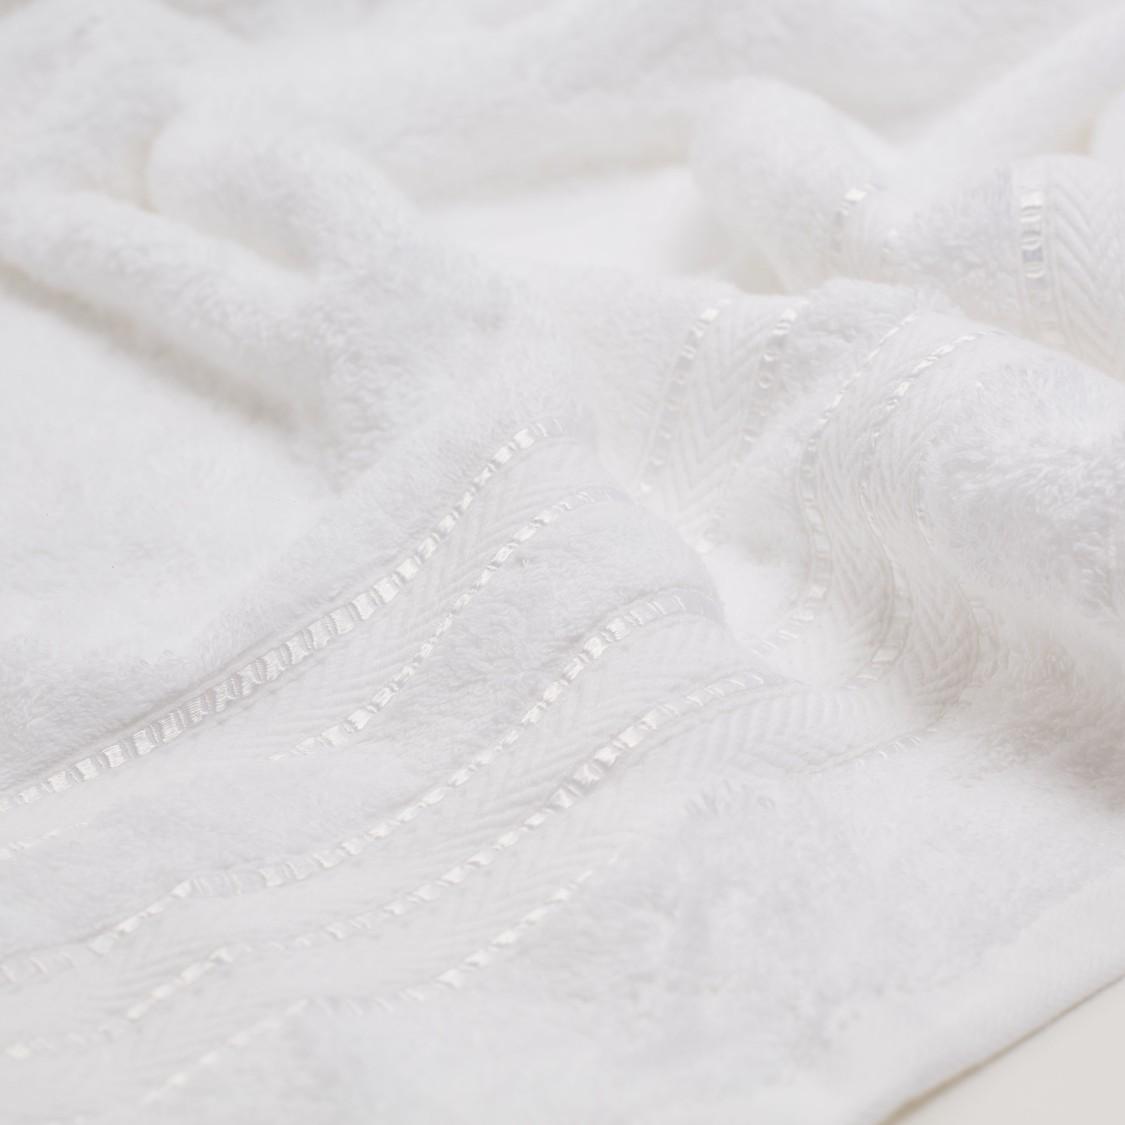 Textured Egyptian Cotton Bath Sheet - 150x90 cms